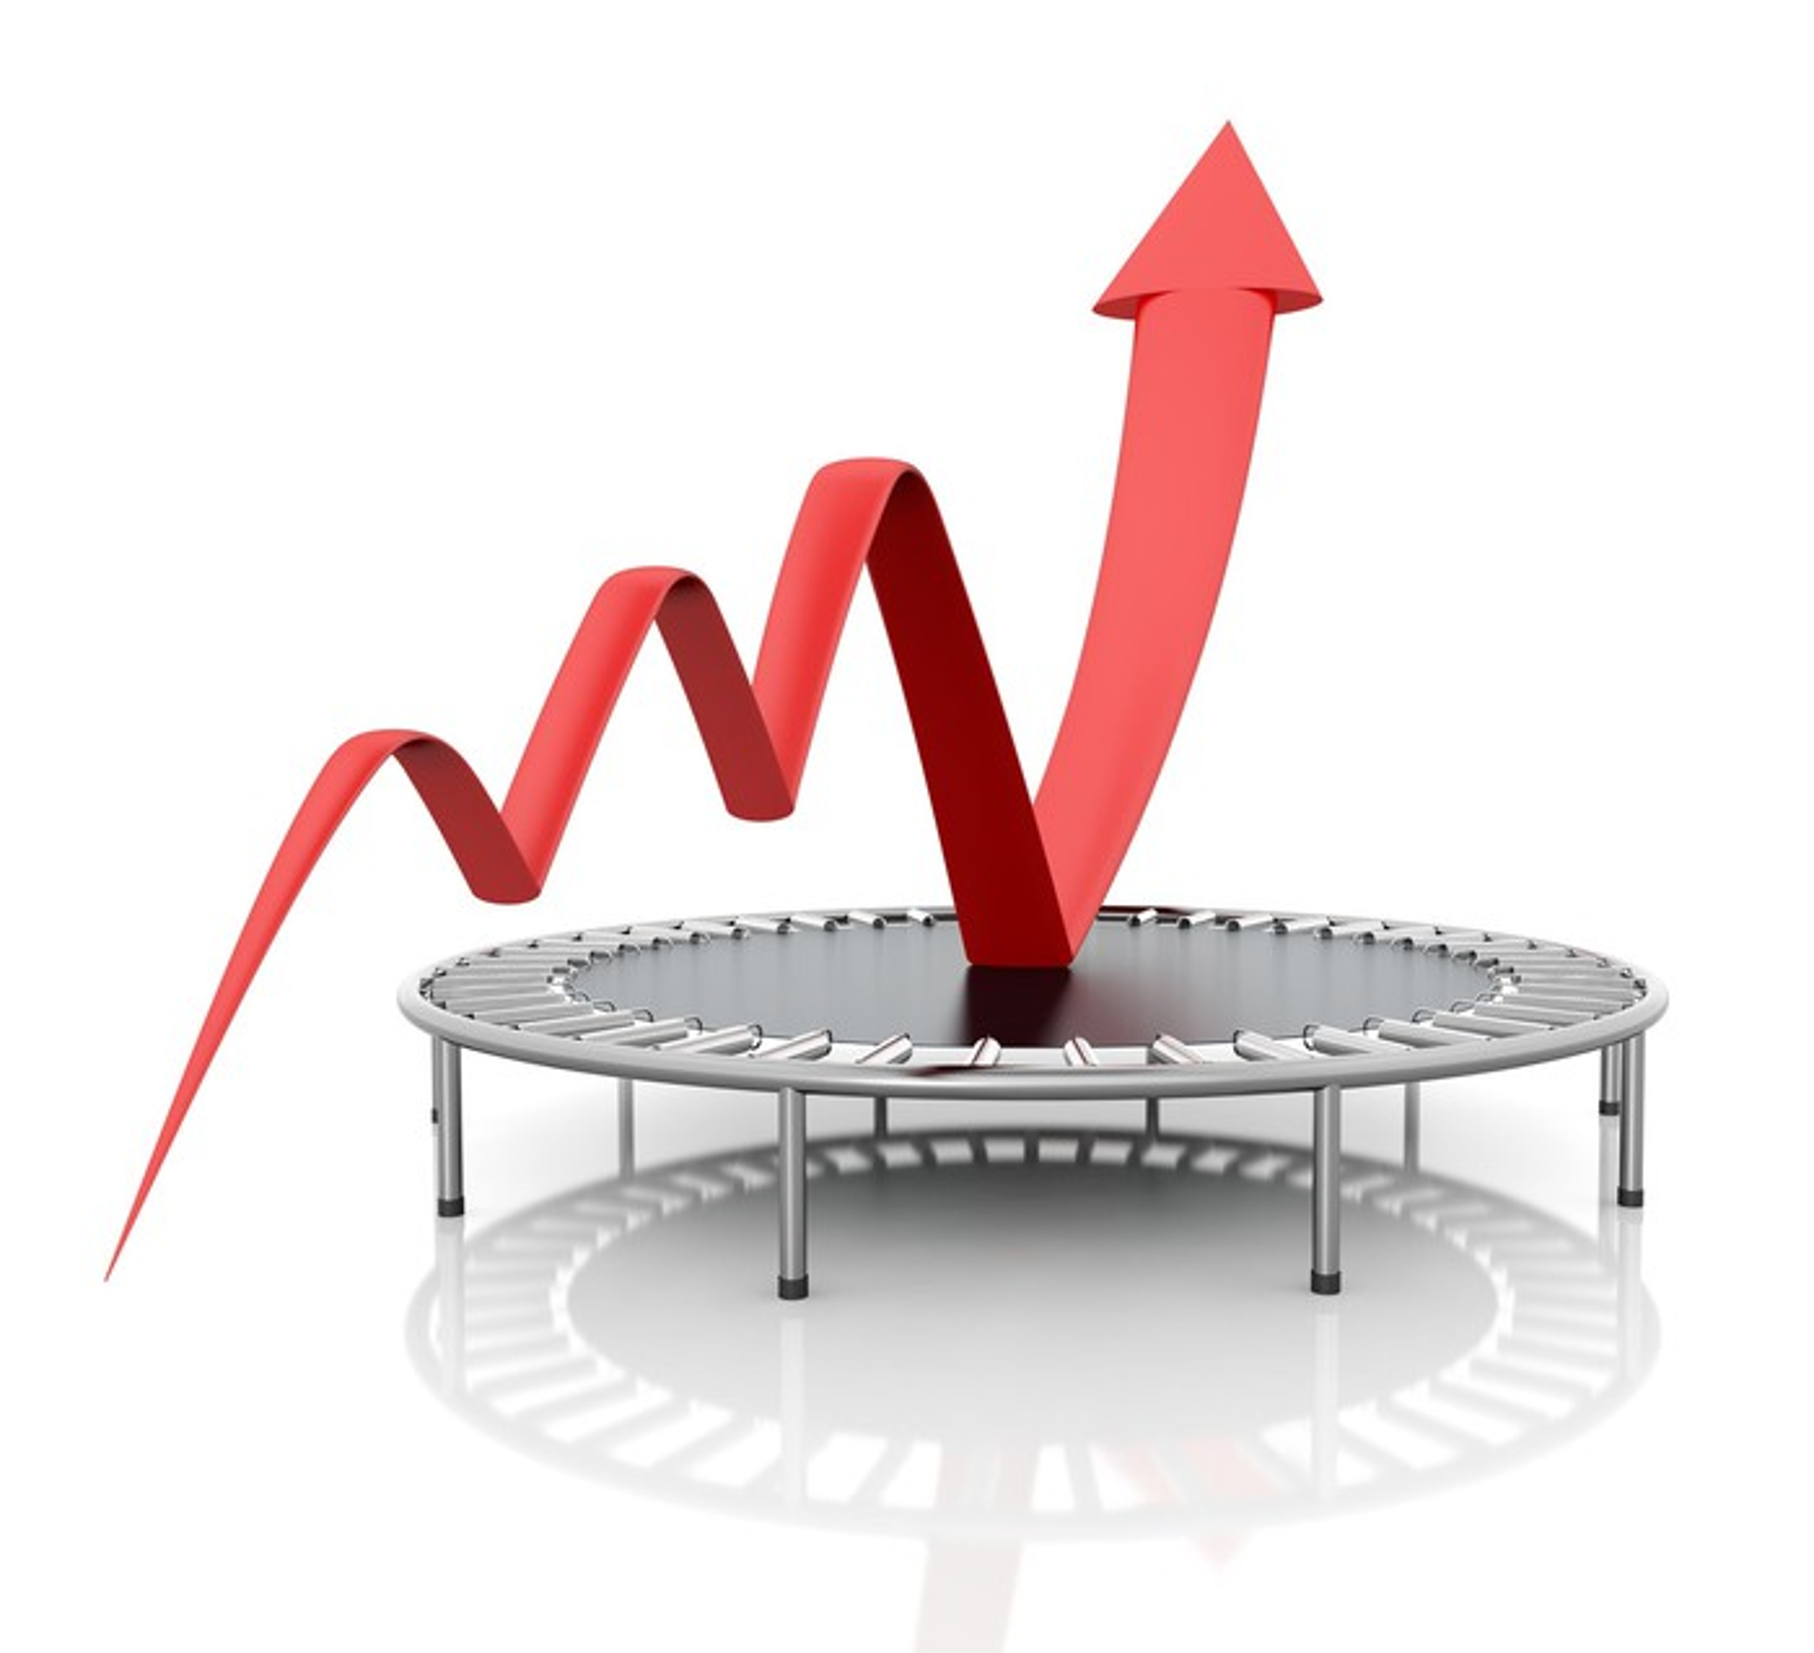 Stylized chart arrow bouncing off a trampoline, then rising upwards.